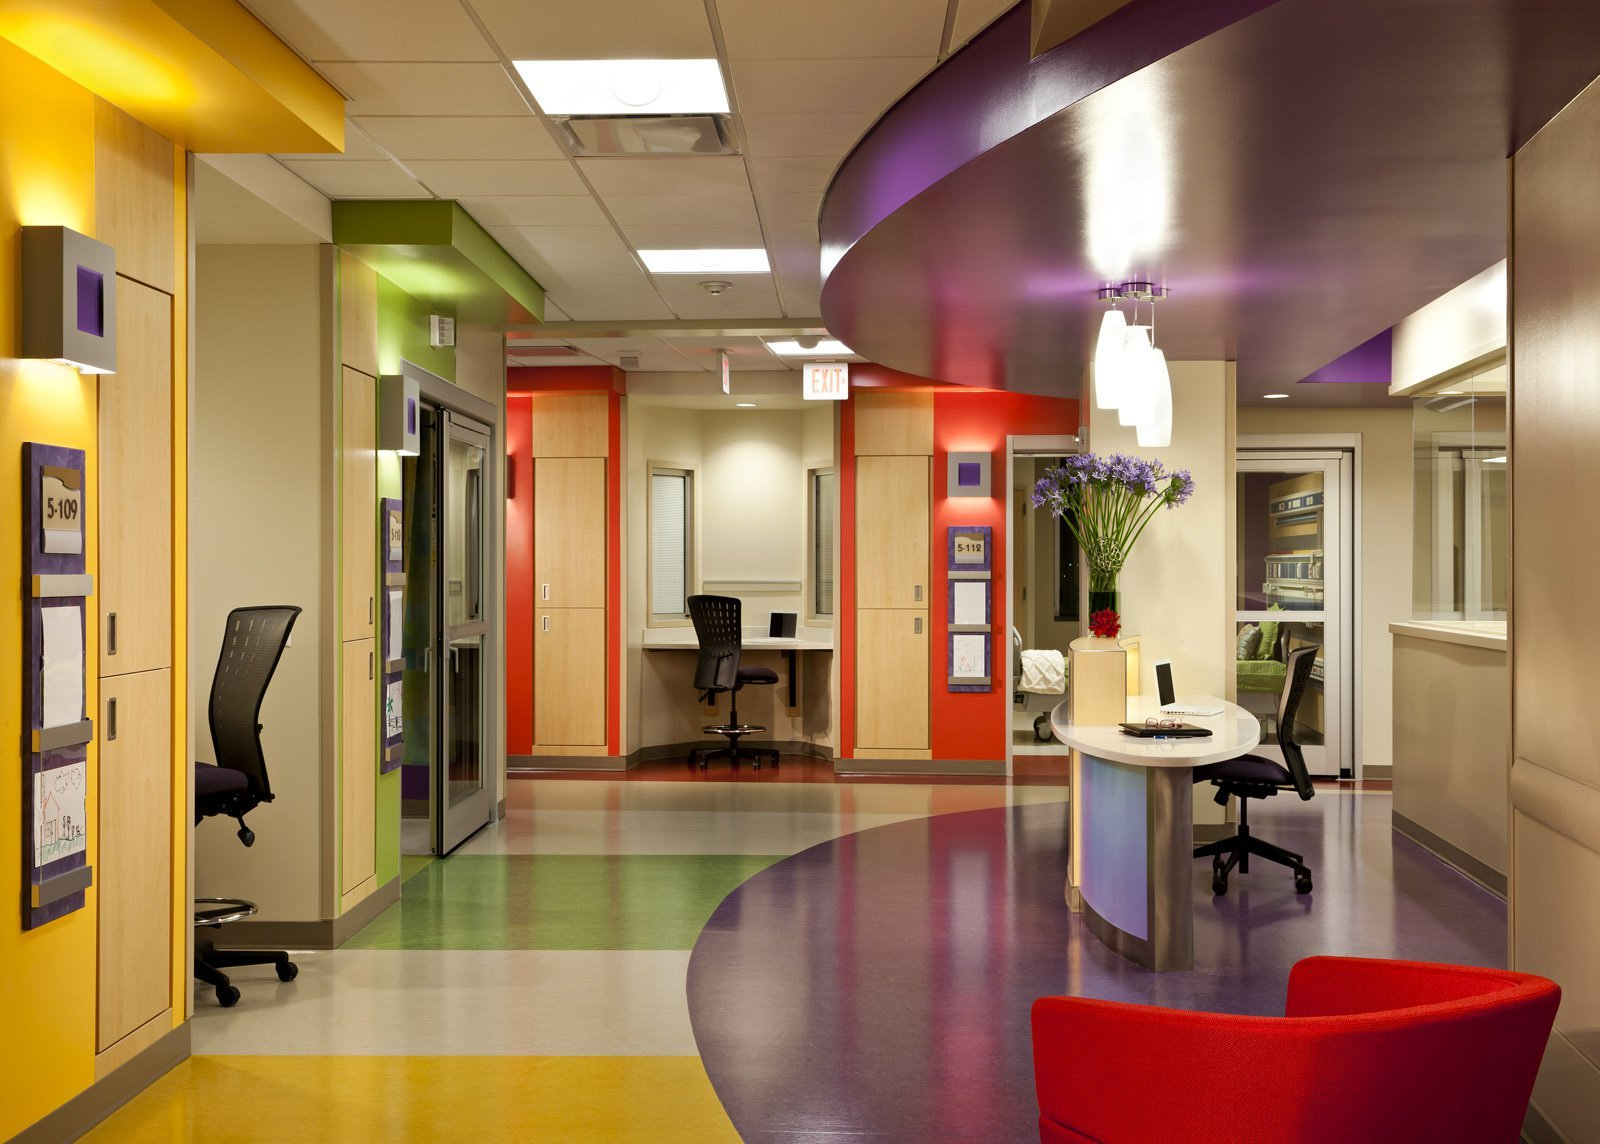 Gallery of Phoenix Children's Hospital / HKS Architects - 21